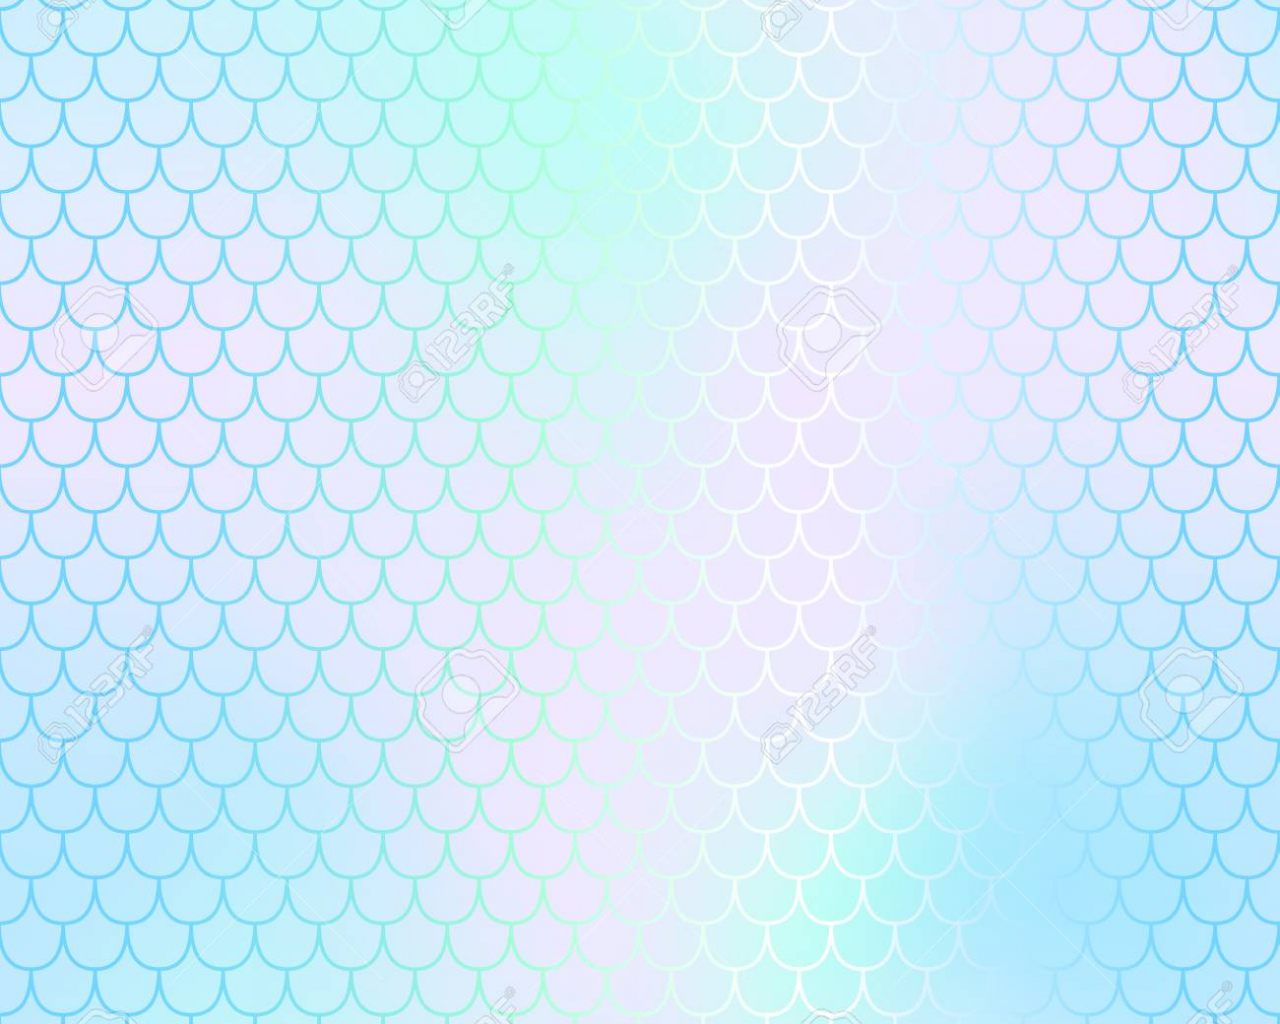 Free Download Mermaid Skin Or Fish Scale Pattern Pale Pink